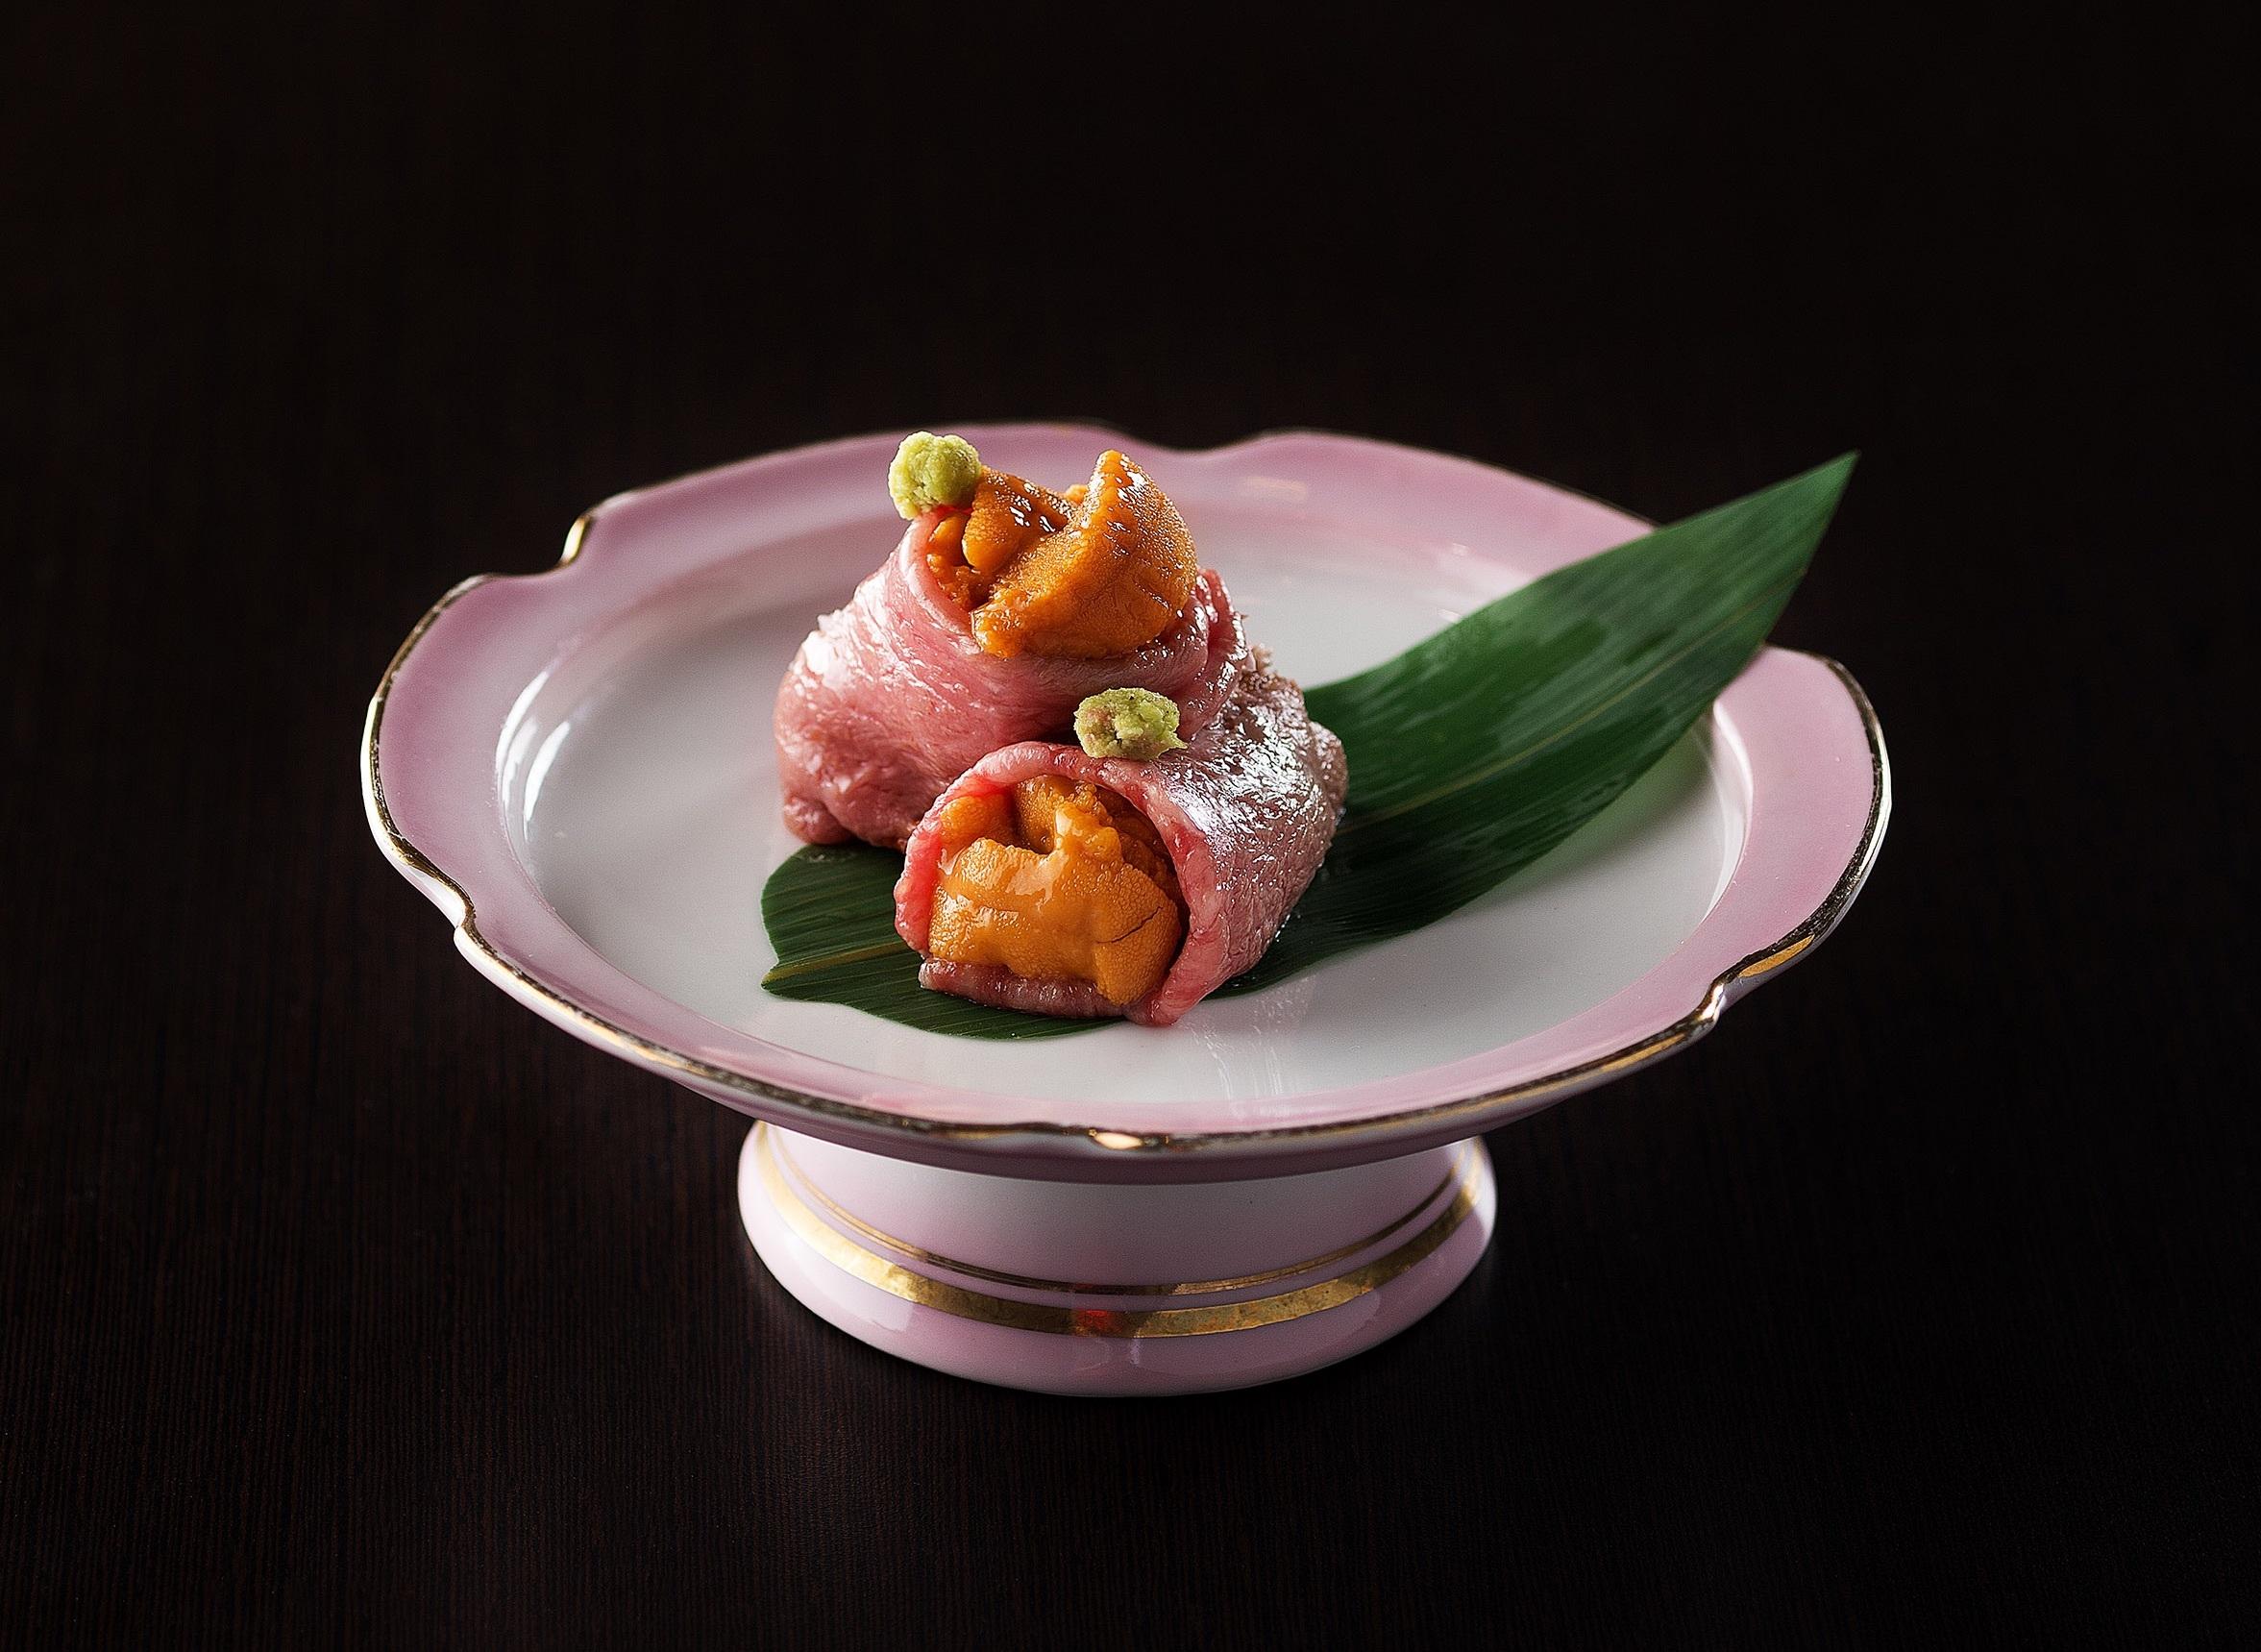 Shikigiku - grilled Kagoshima beef with sea urchin